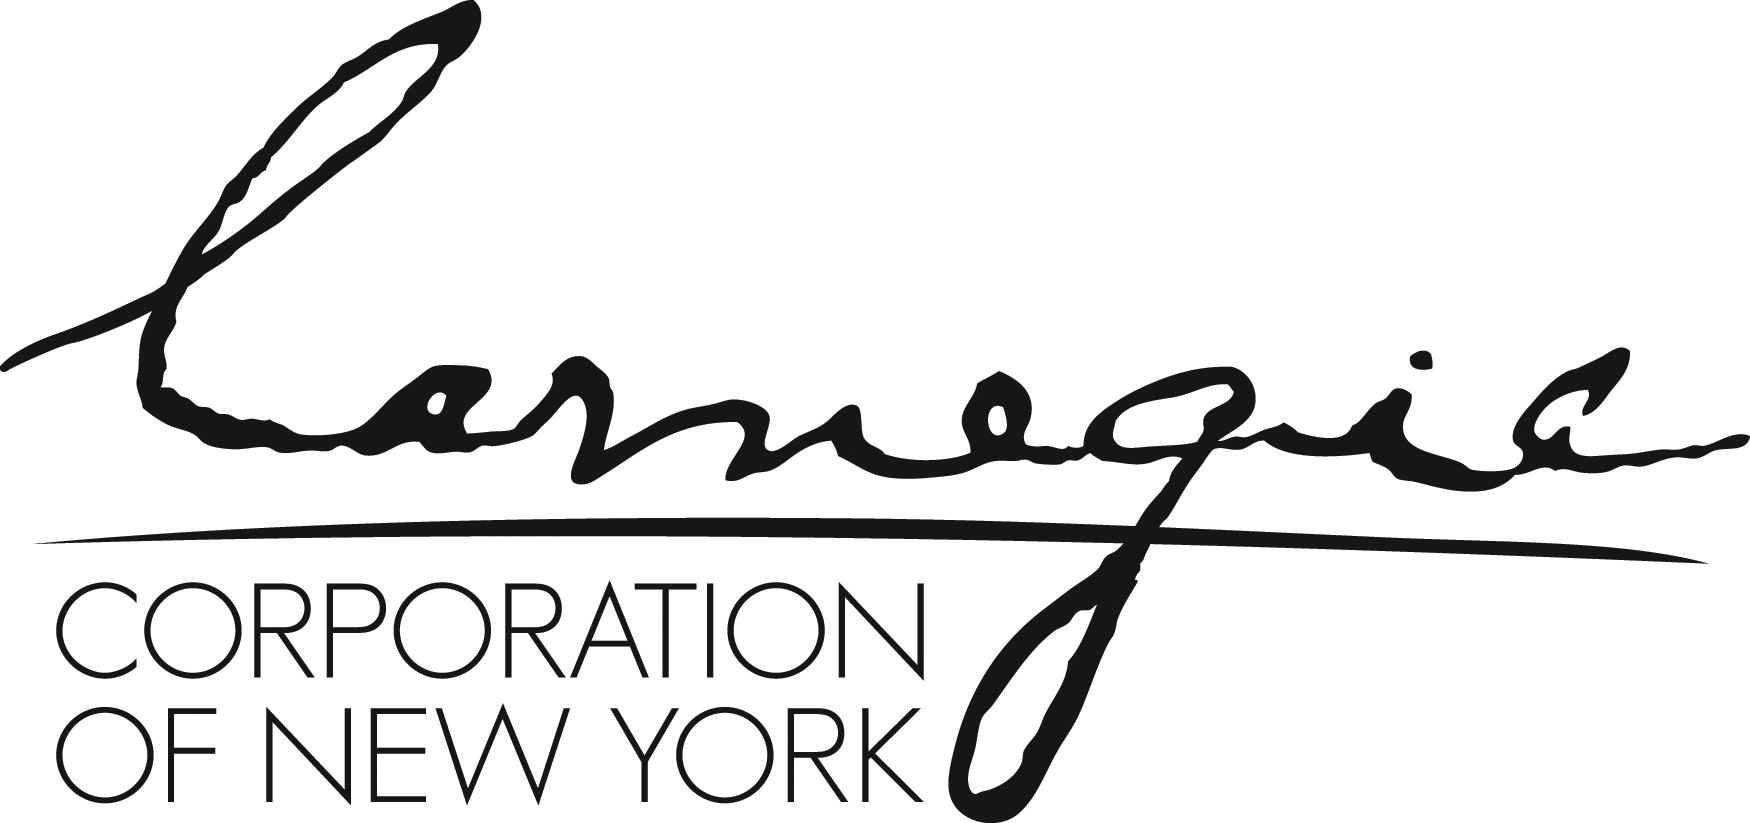 Carnegie_Logo_Black.jpg